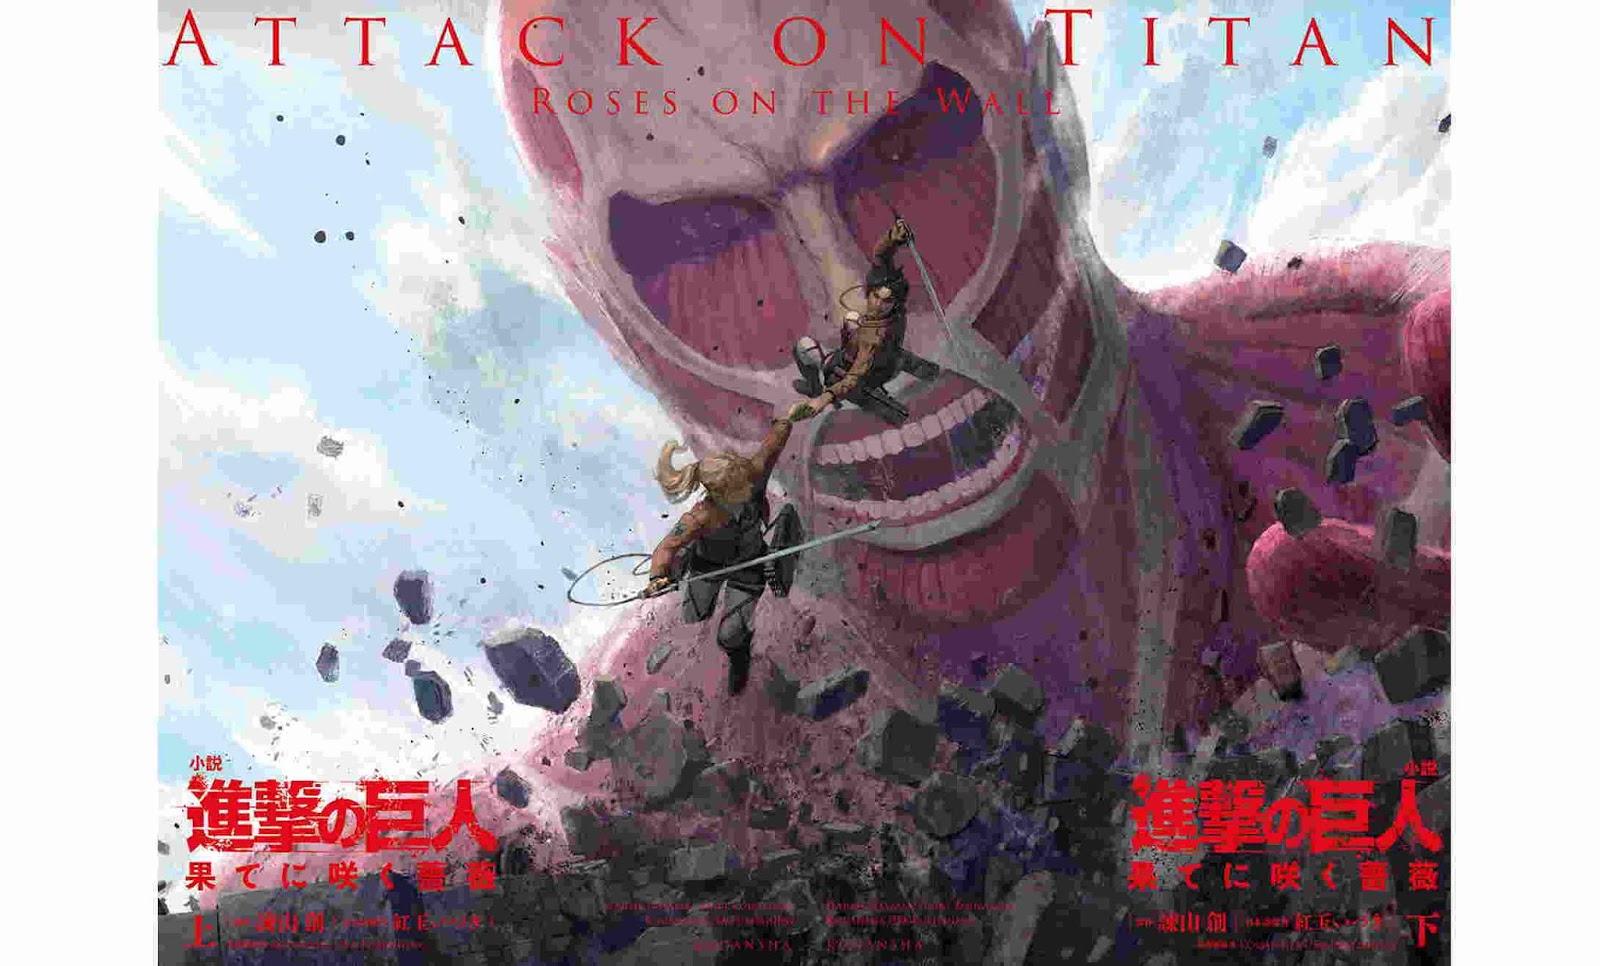 Attack On Titan Roses On The Wall Rilis Hari Ini